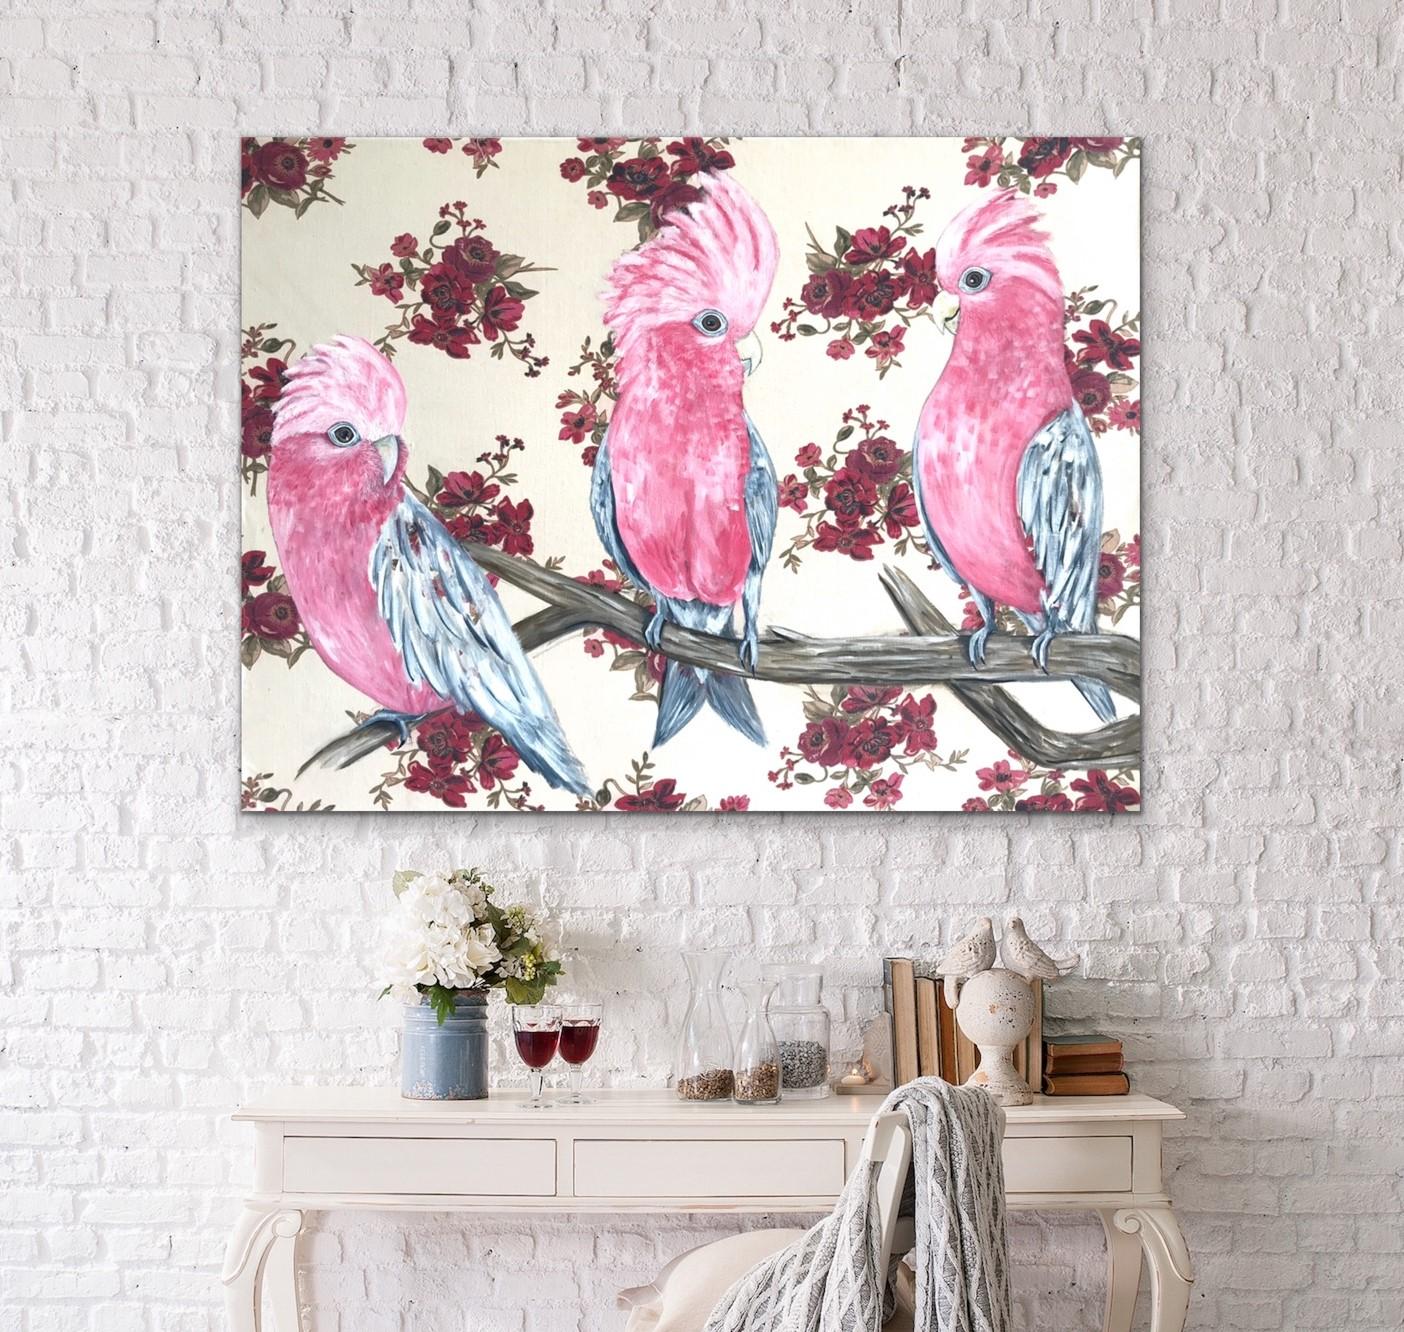 The Pink Ladies Artloversaustralia